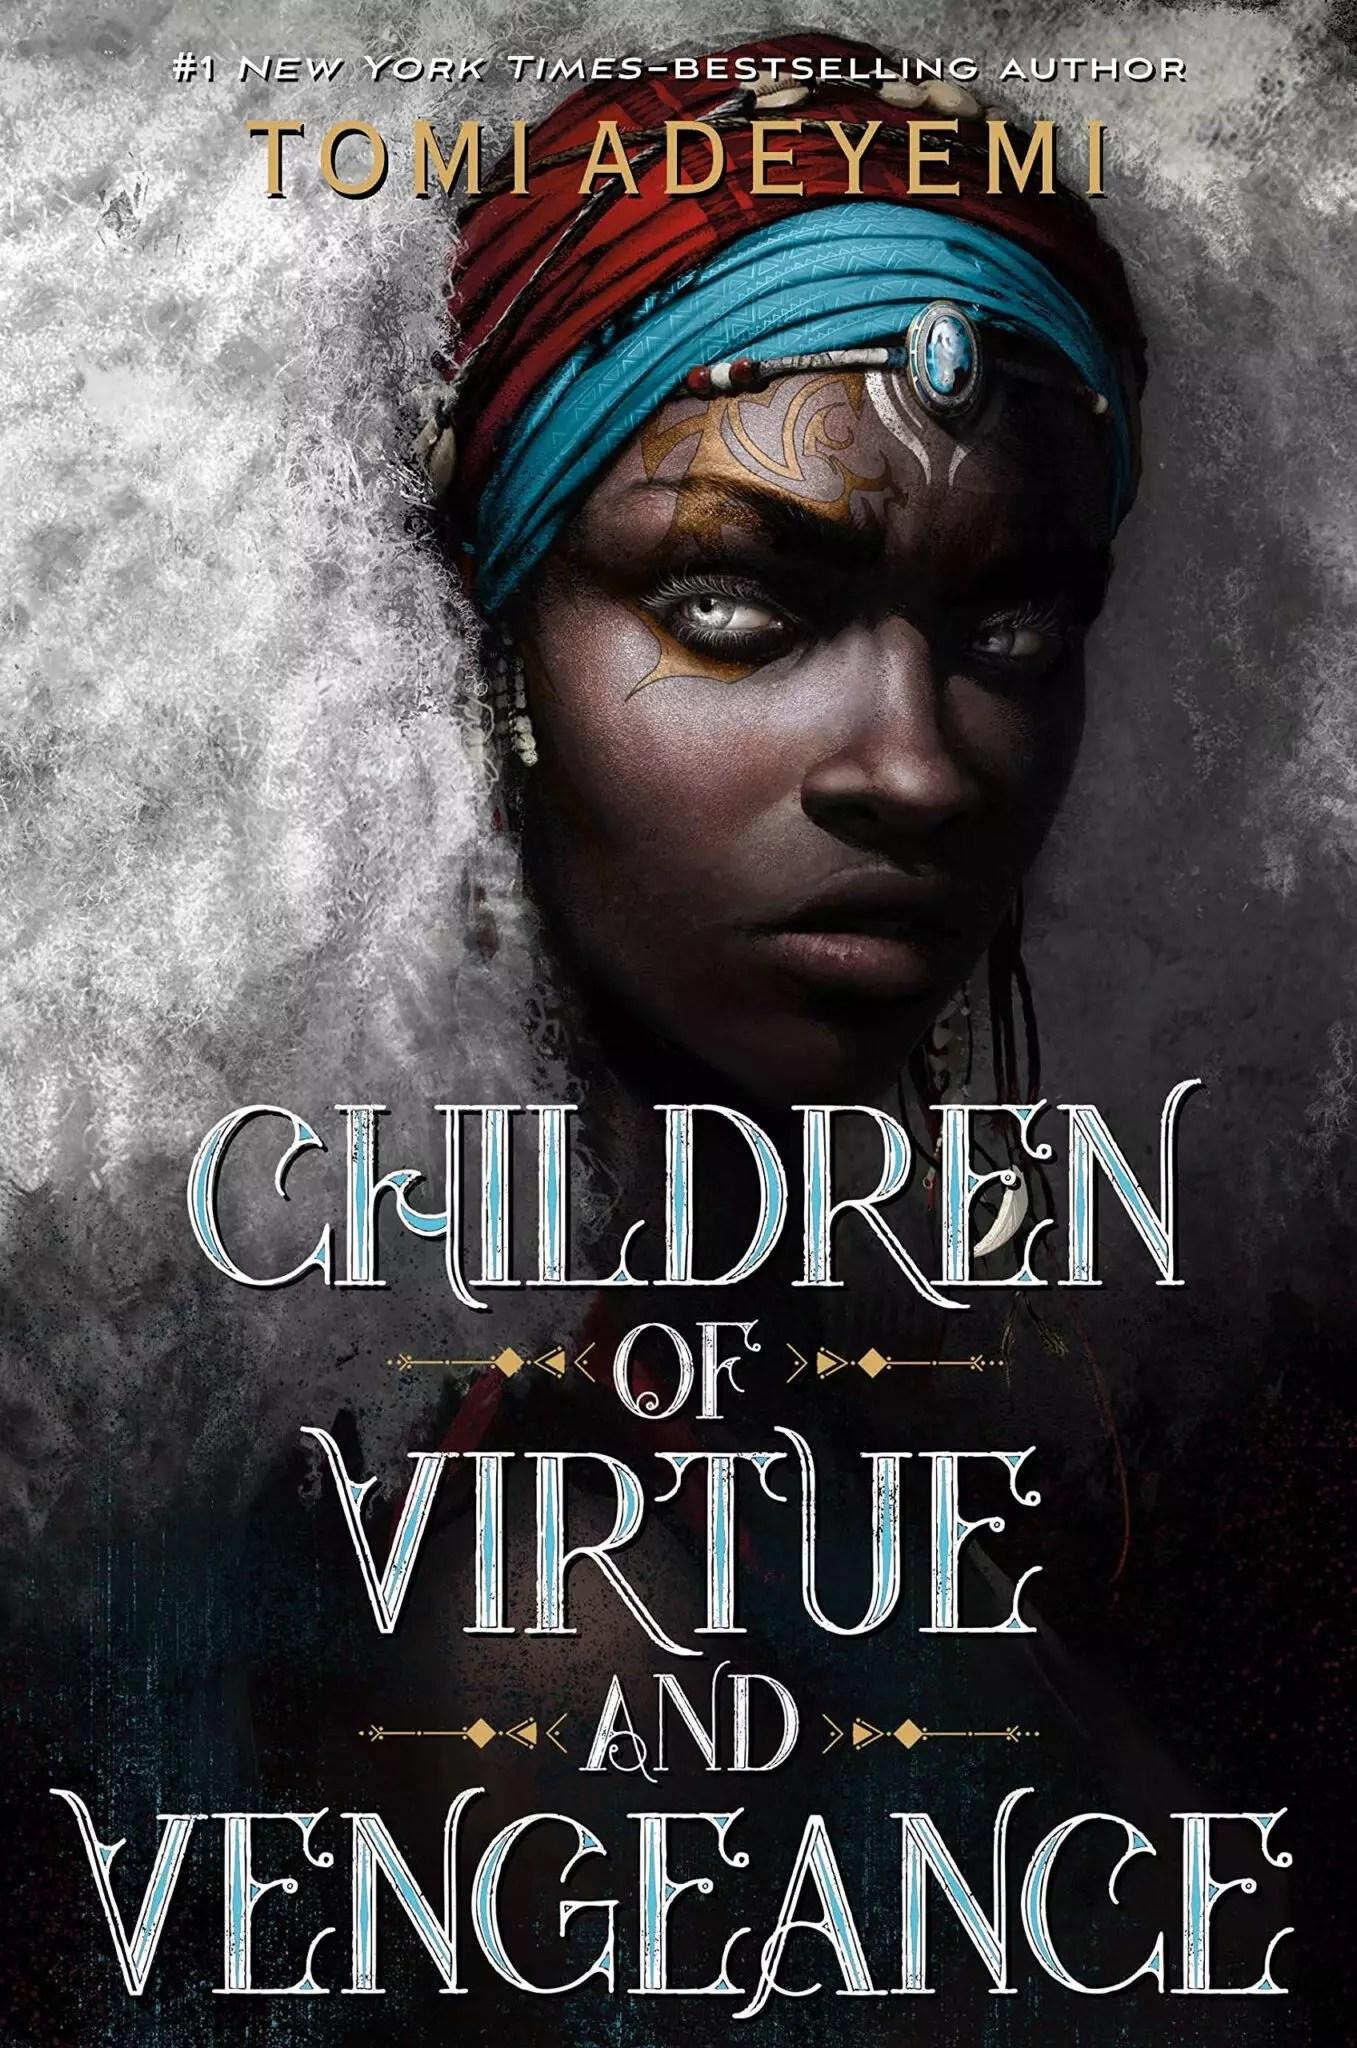 tomi adeyami children of virtue vengeance US cover